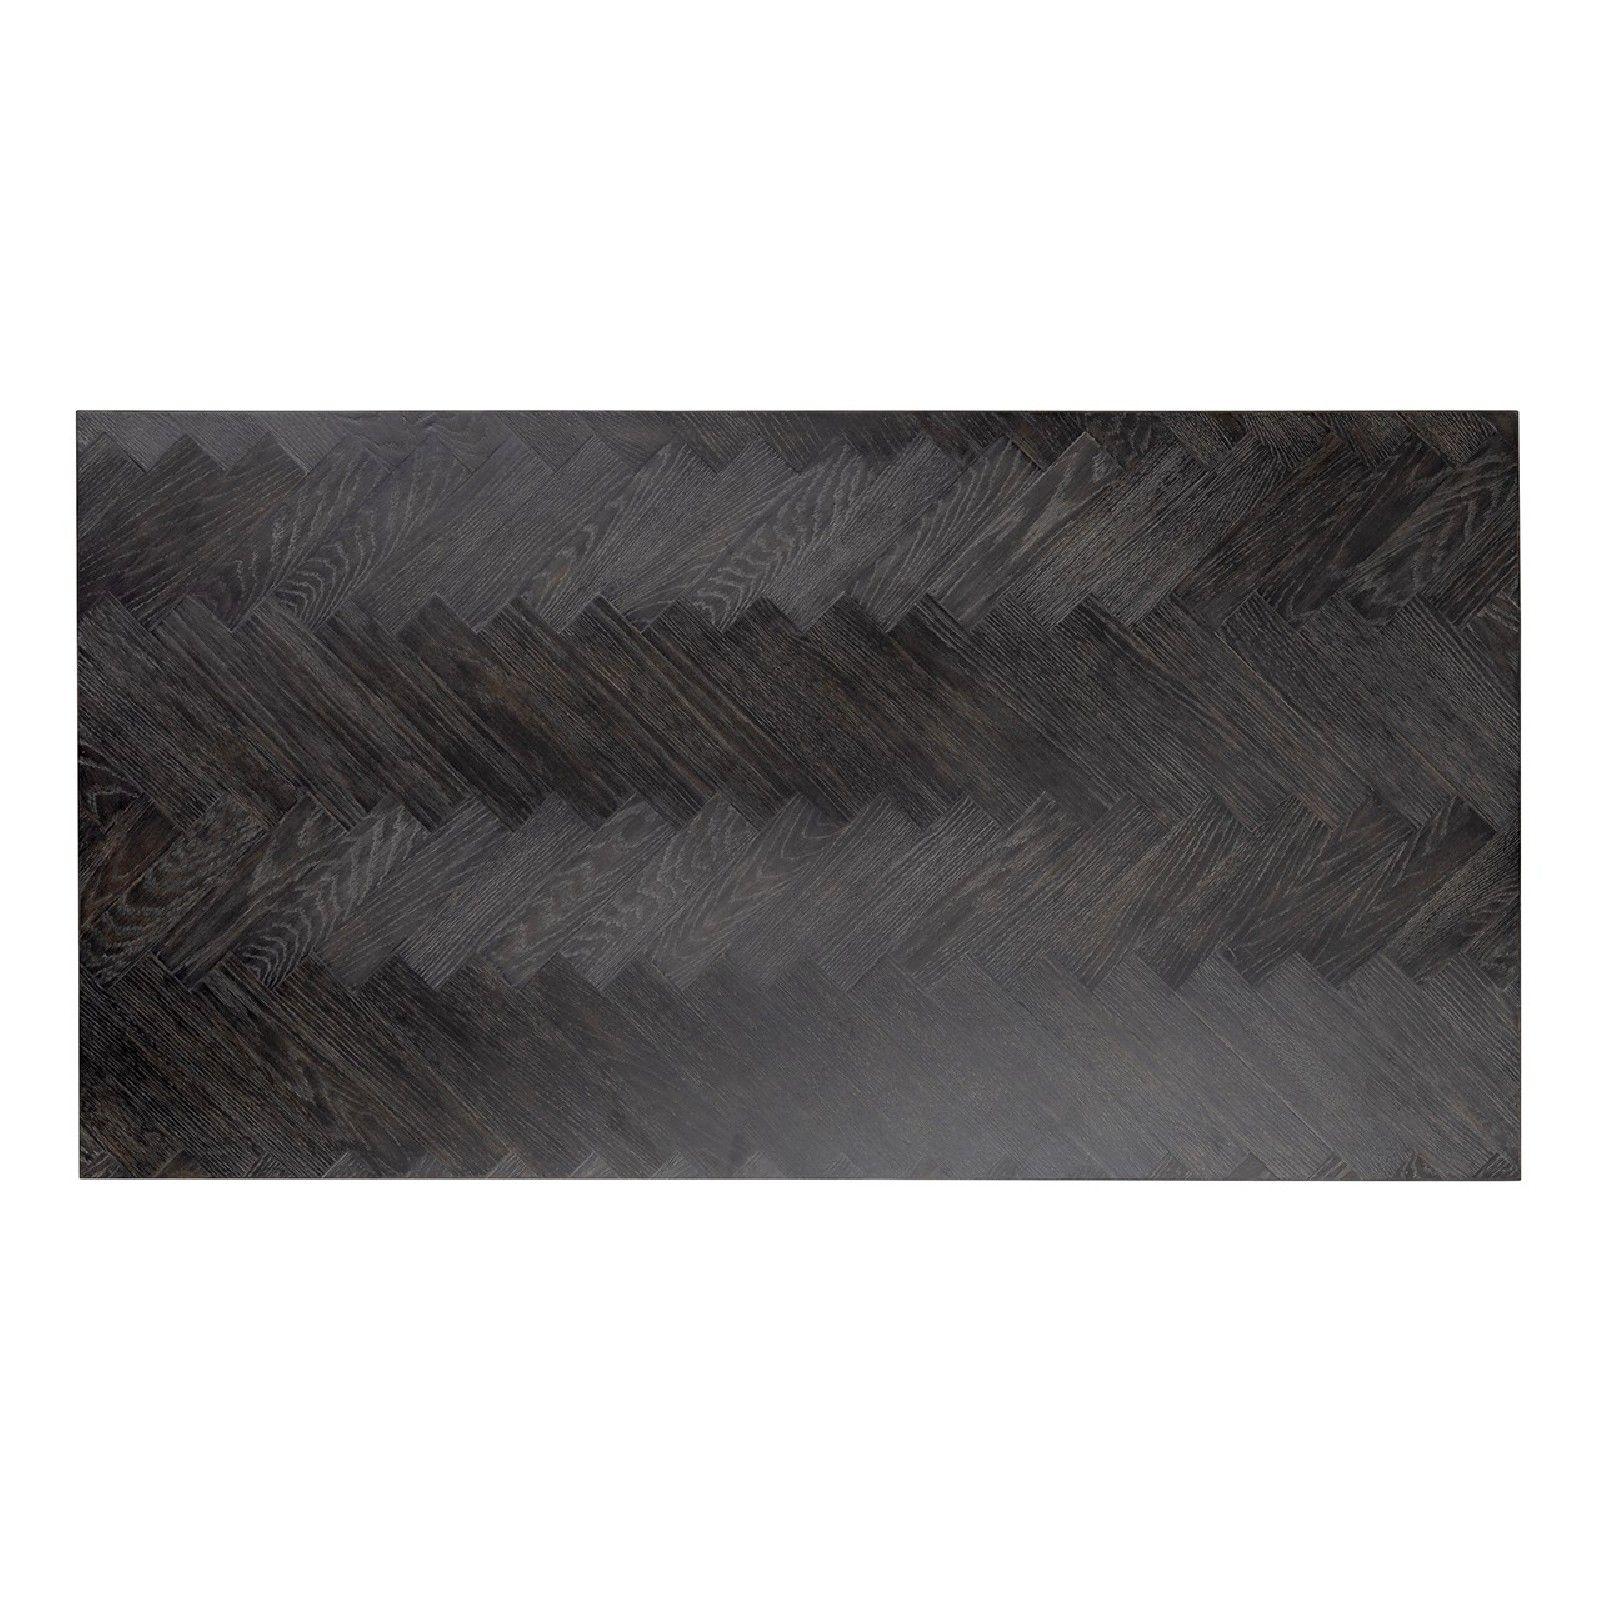 Table de salon Blackbone silver 150x80 (Block) Tables basses rectangulaires - 451